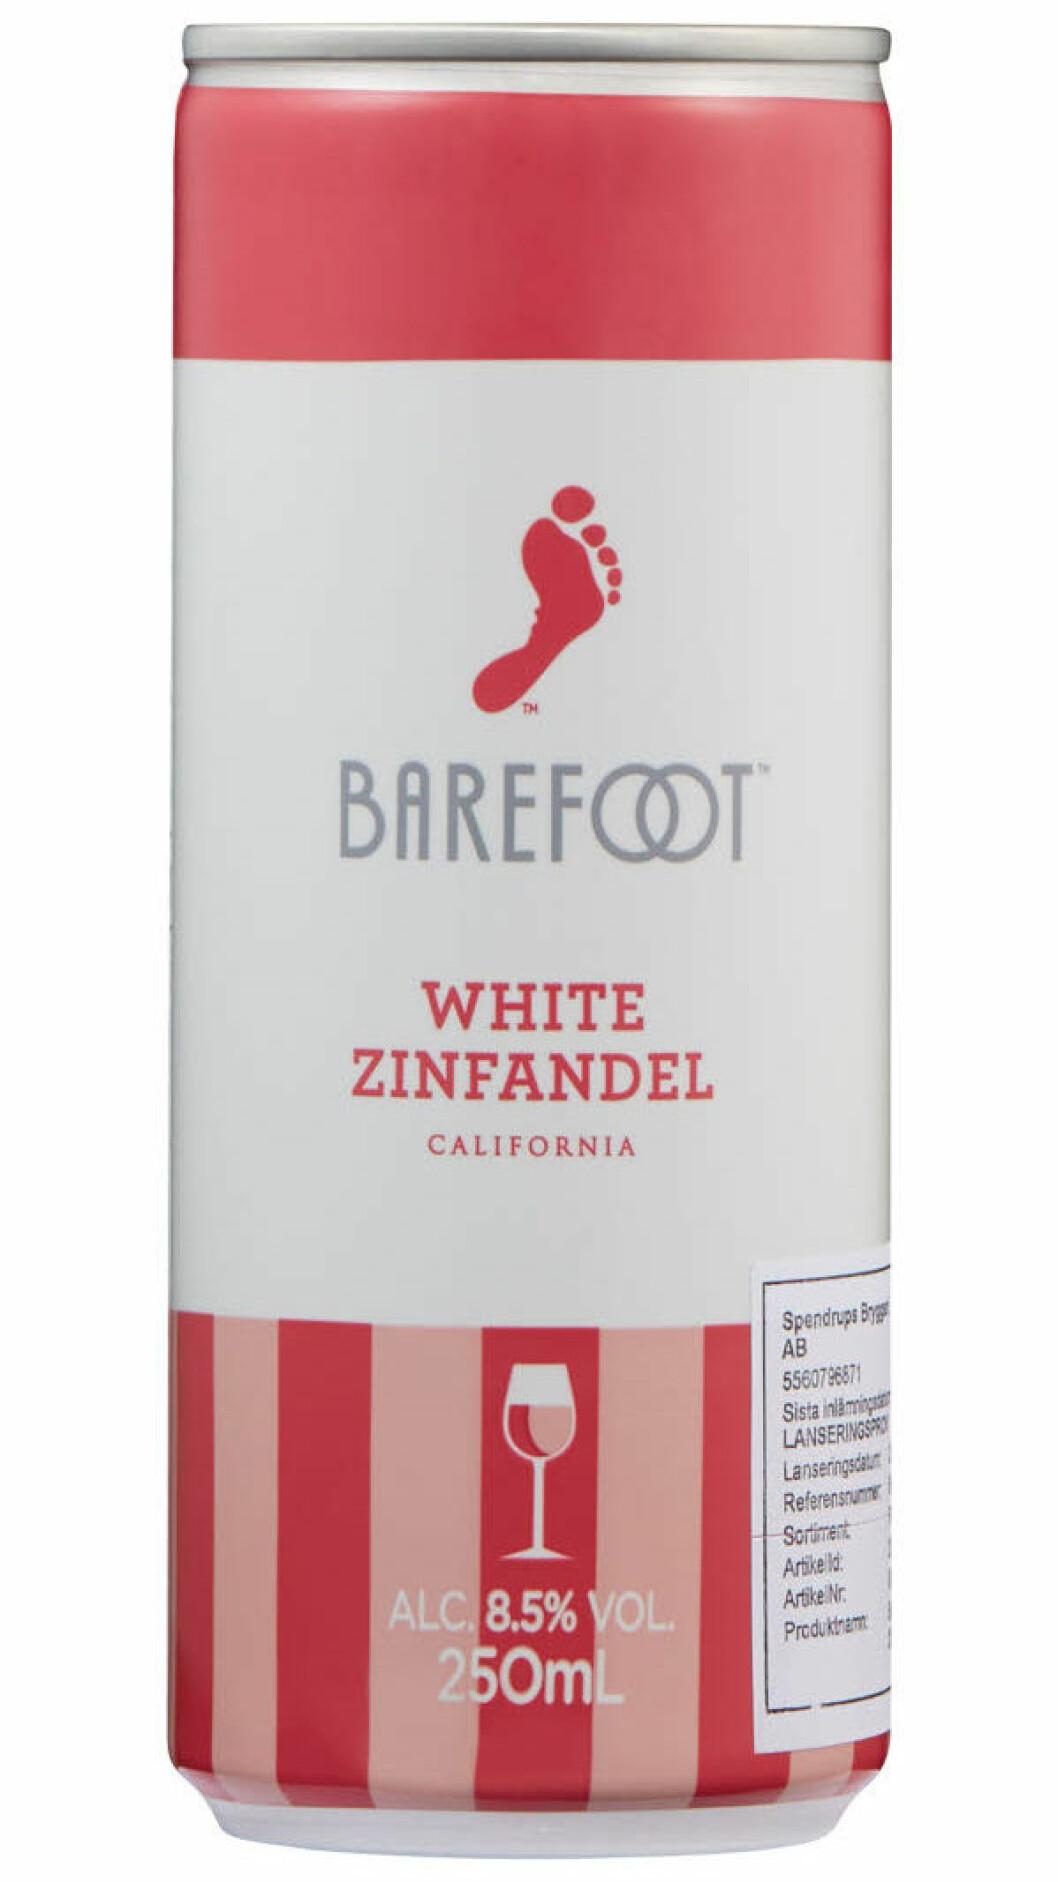 barefoot white zinfandel